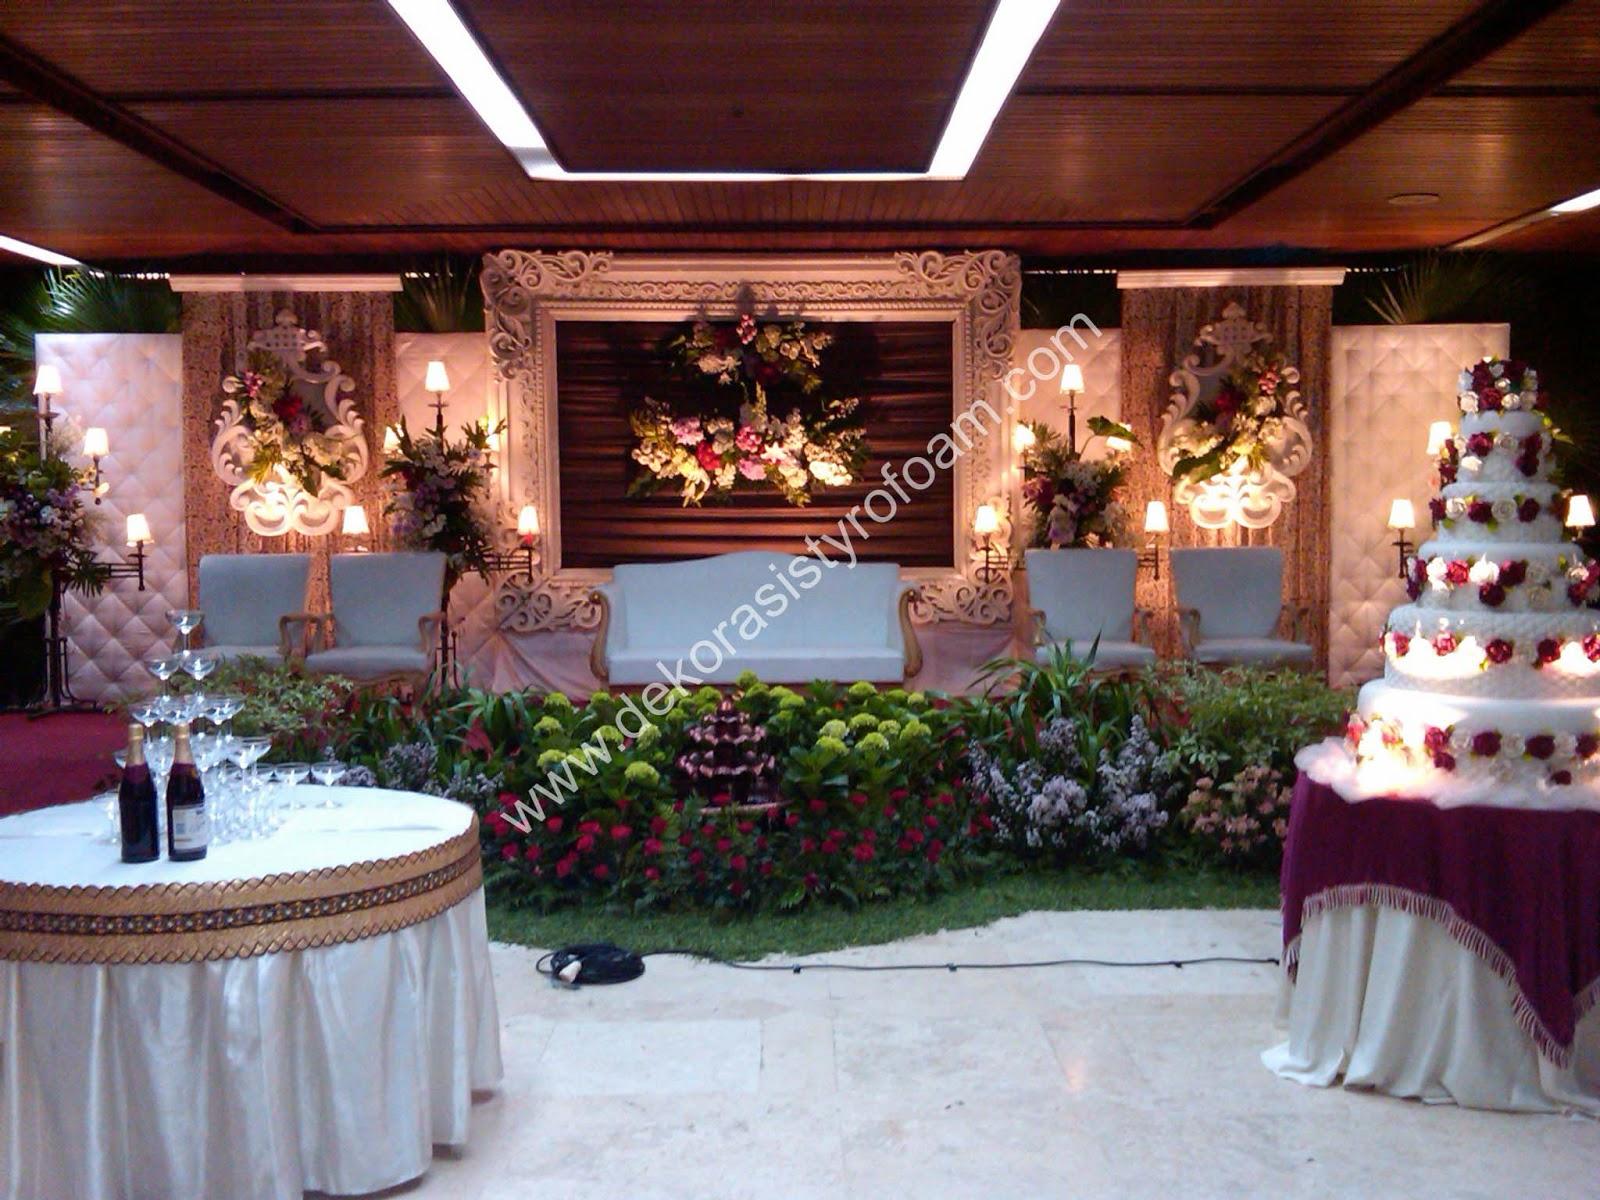 Dekorasi styrofoam dekorasi pelaminan a 5 for Dekorasi lebaran hotel